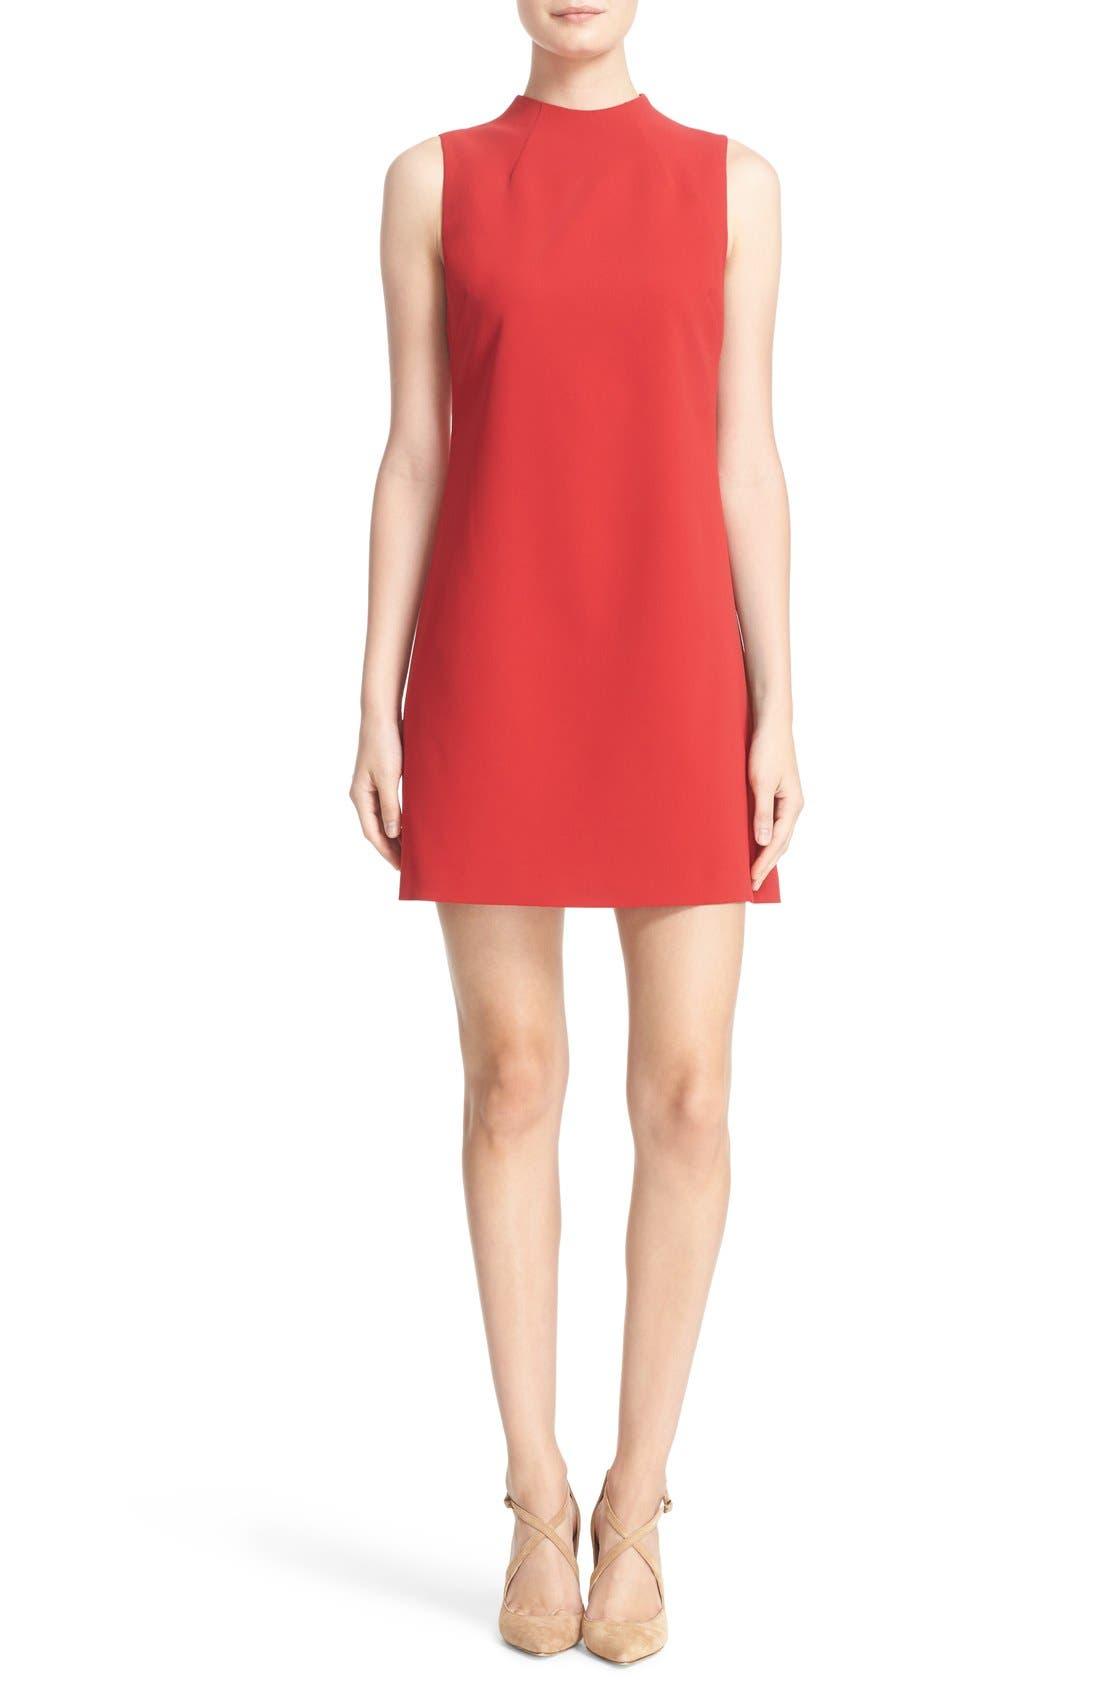 ALICE + OLIVIA 'Coley' Mock Neck A-Line Dress, Main, color, 623